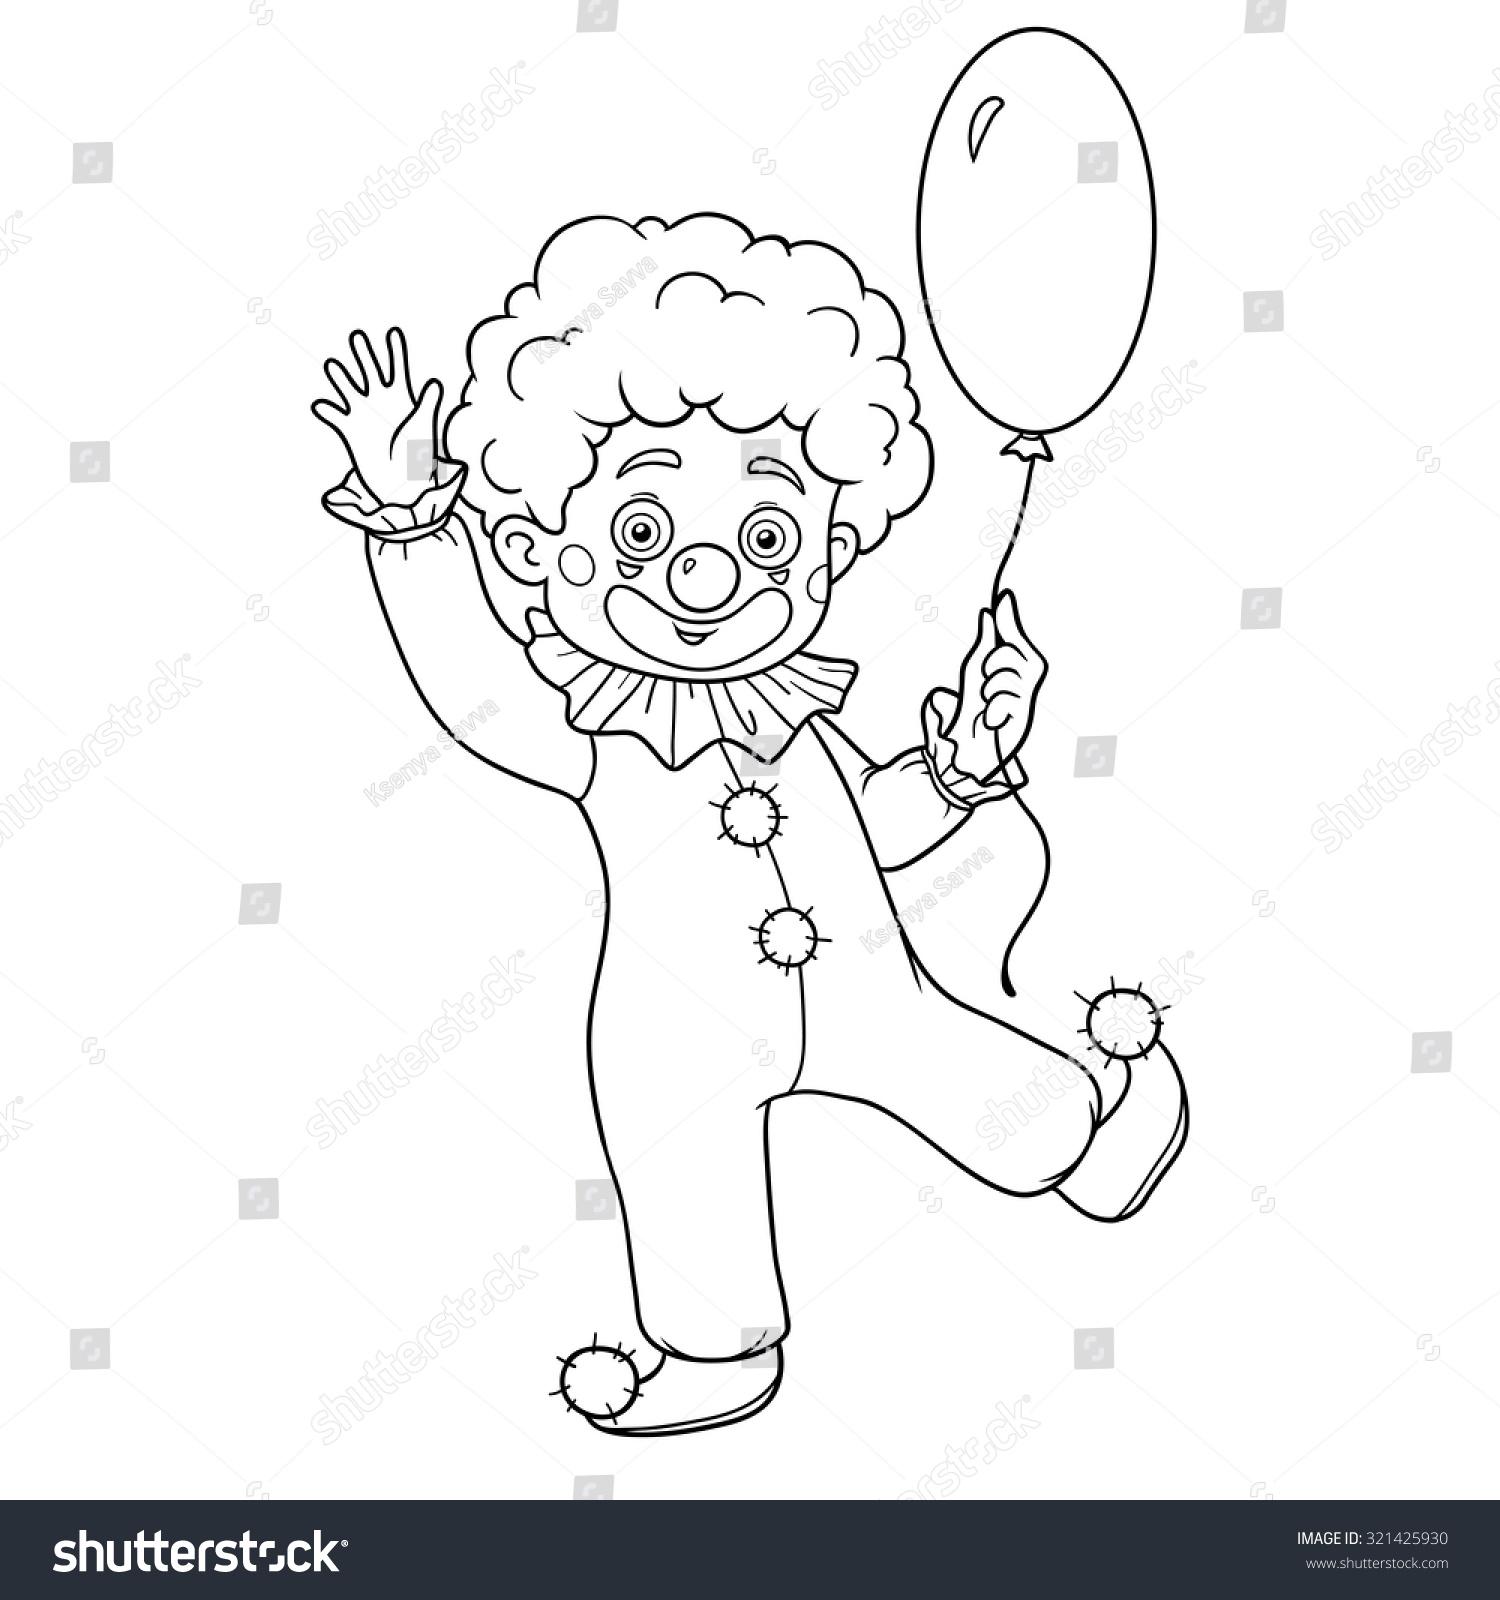 Coloring Book Children Clown Character Balloon Stock Vector ...